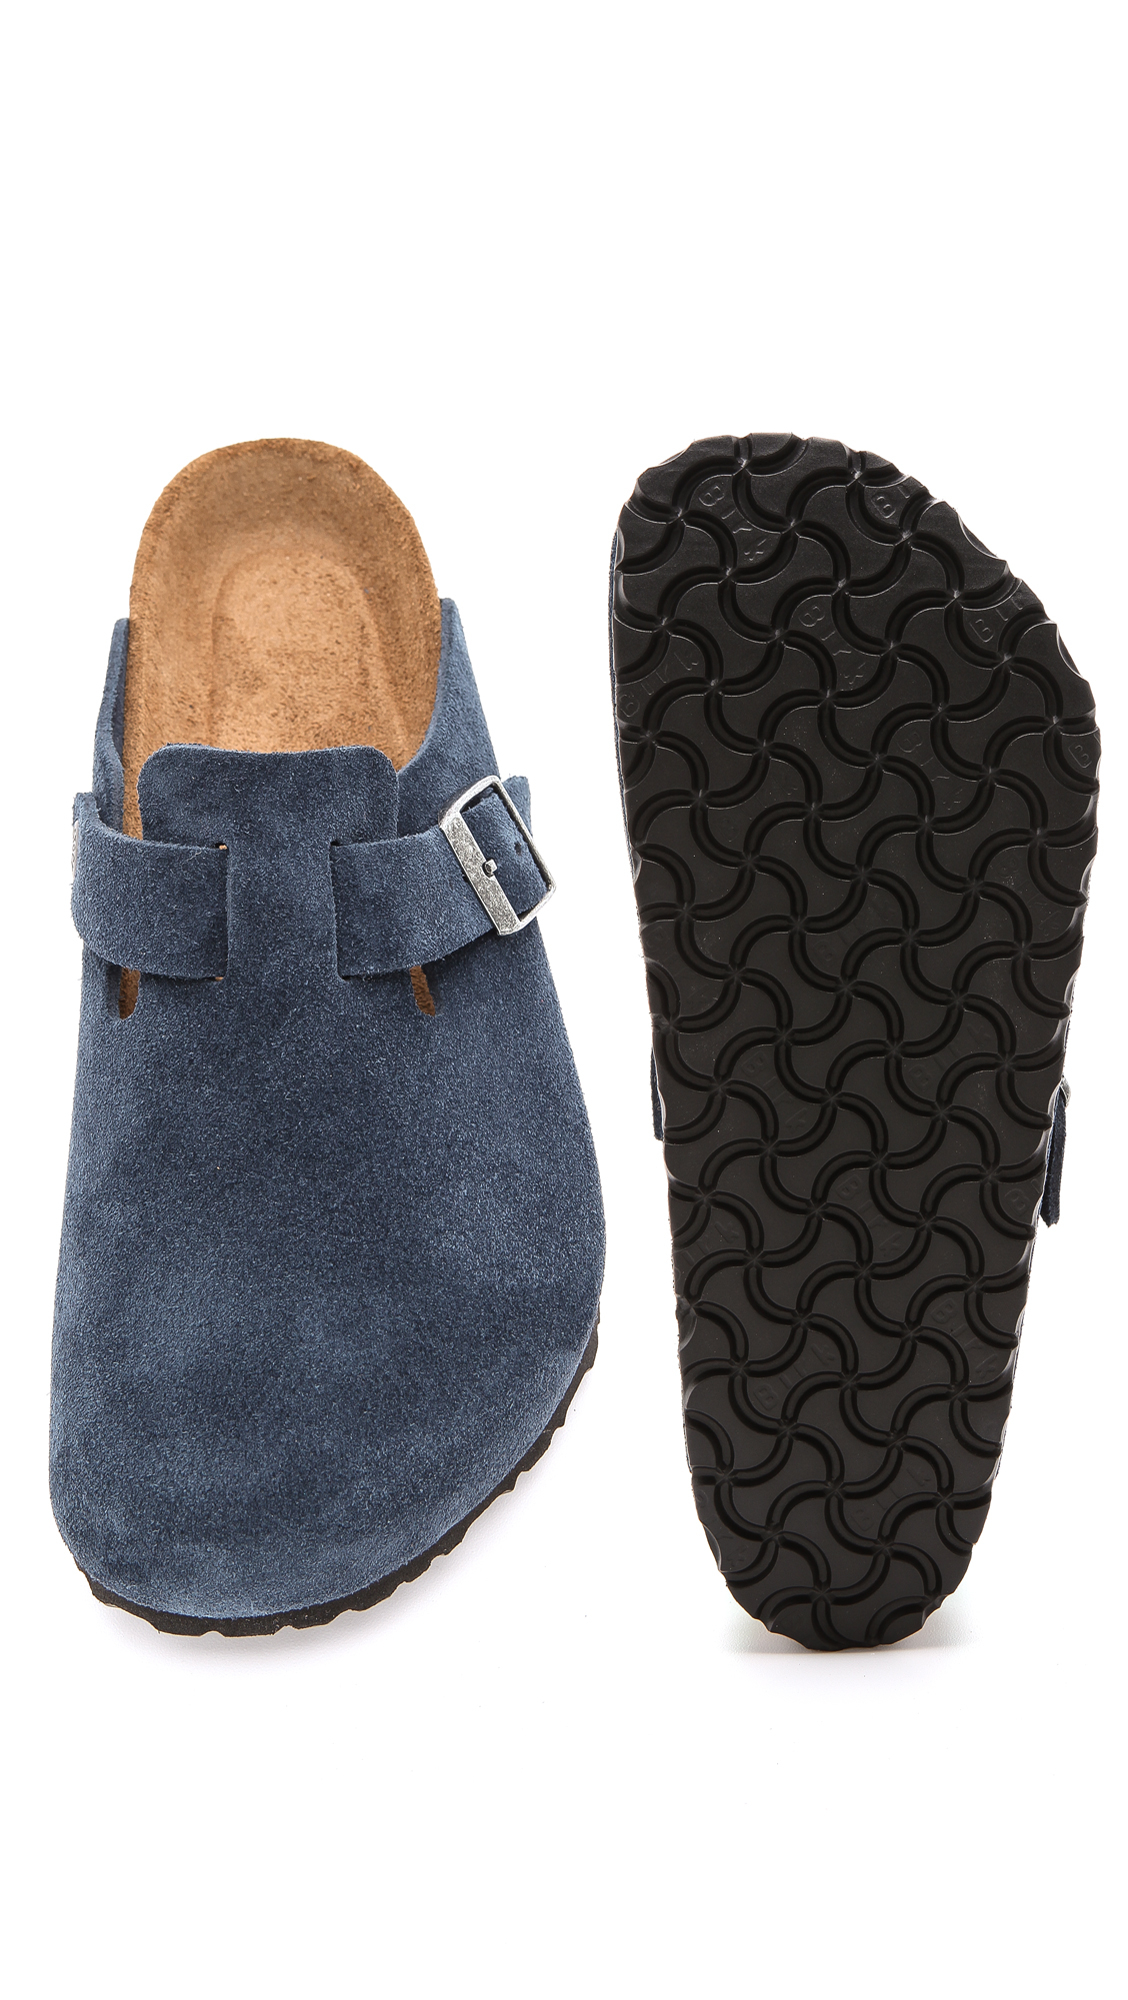 fc29fbb8a210 Lyst - Birkenstock Soft Footbed Boston Clogs in Blue for Men